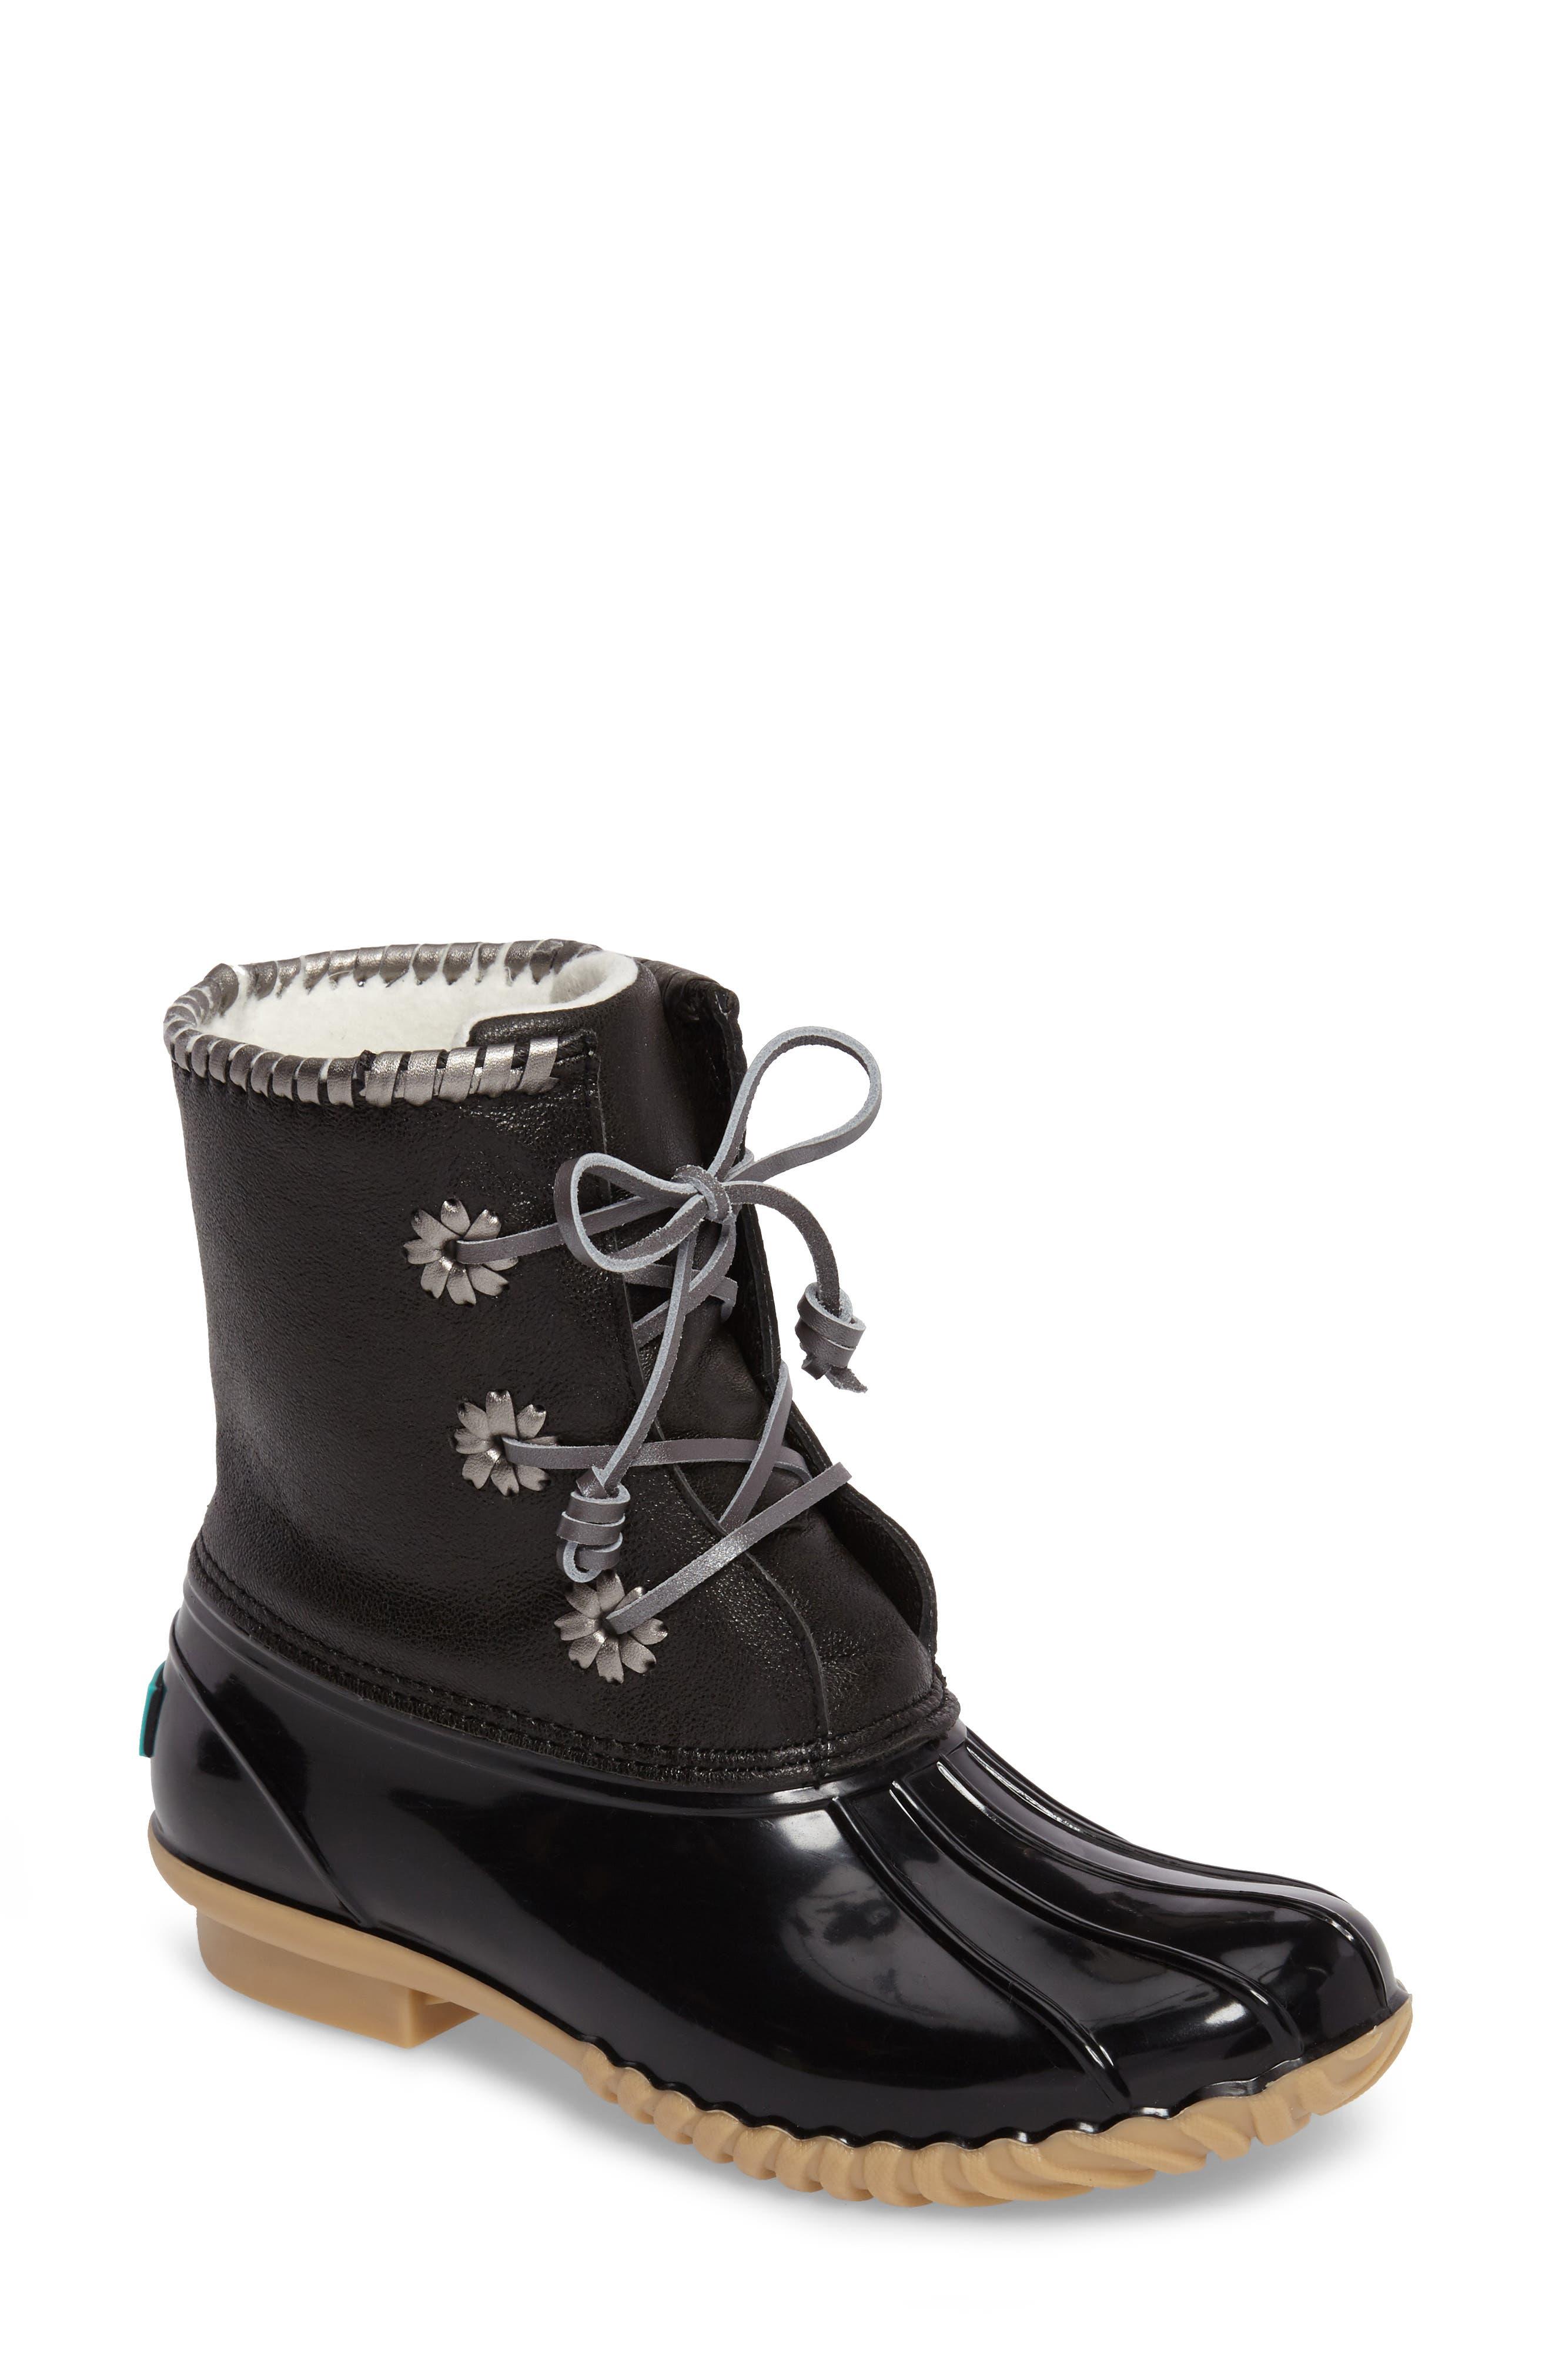 Alternate Image 1 Selected - Jack Rogers 'Chloe' Rain Boot (Women)